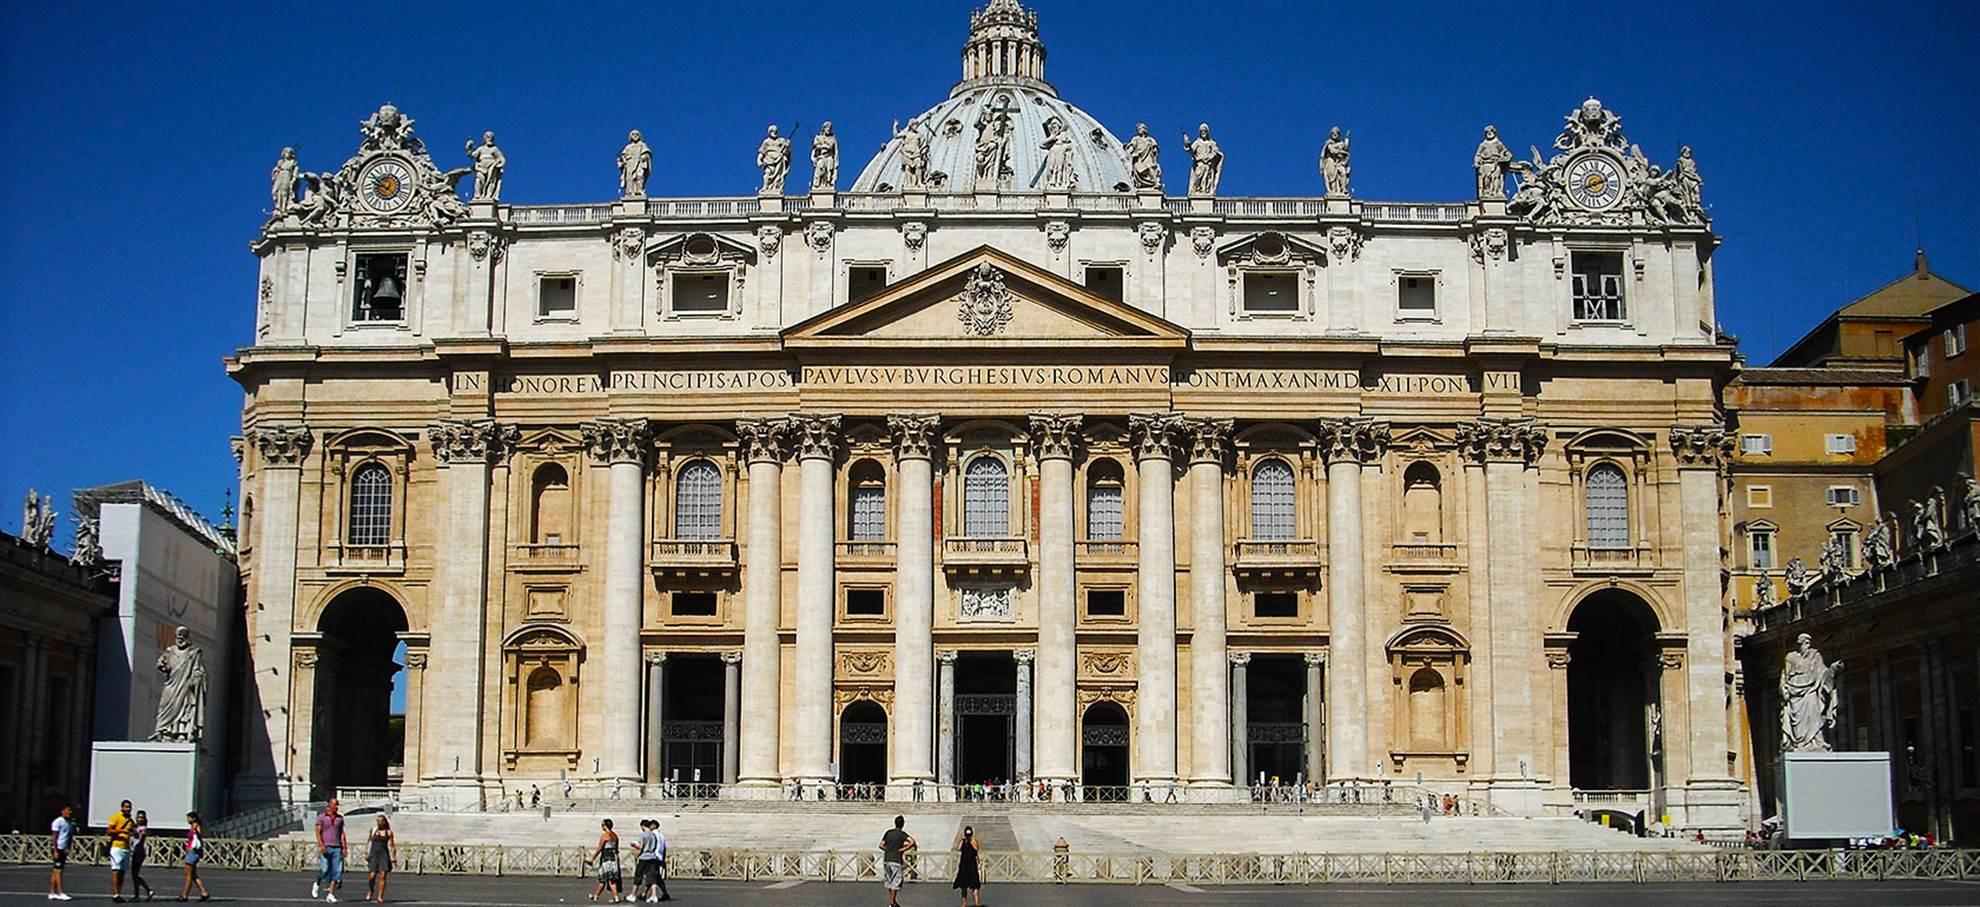 St. Pieter's Basilica - Rondleiding